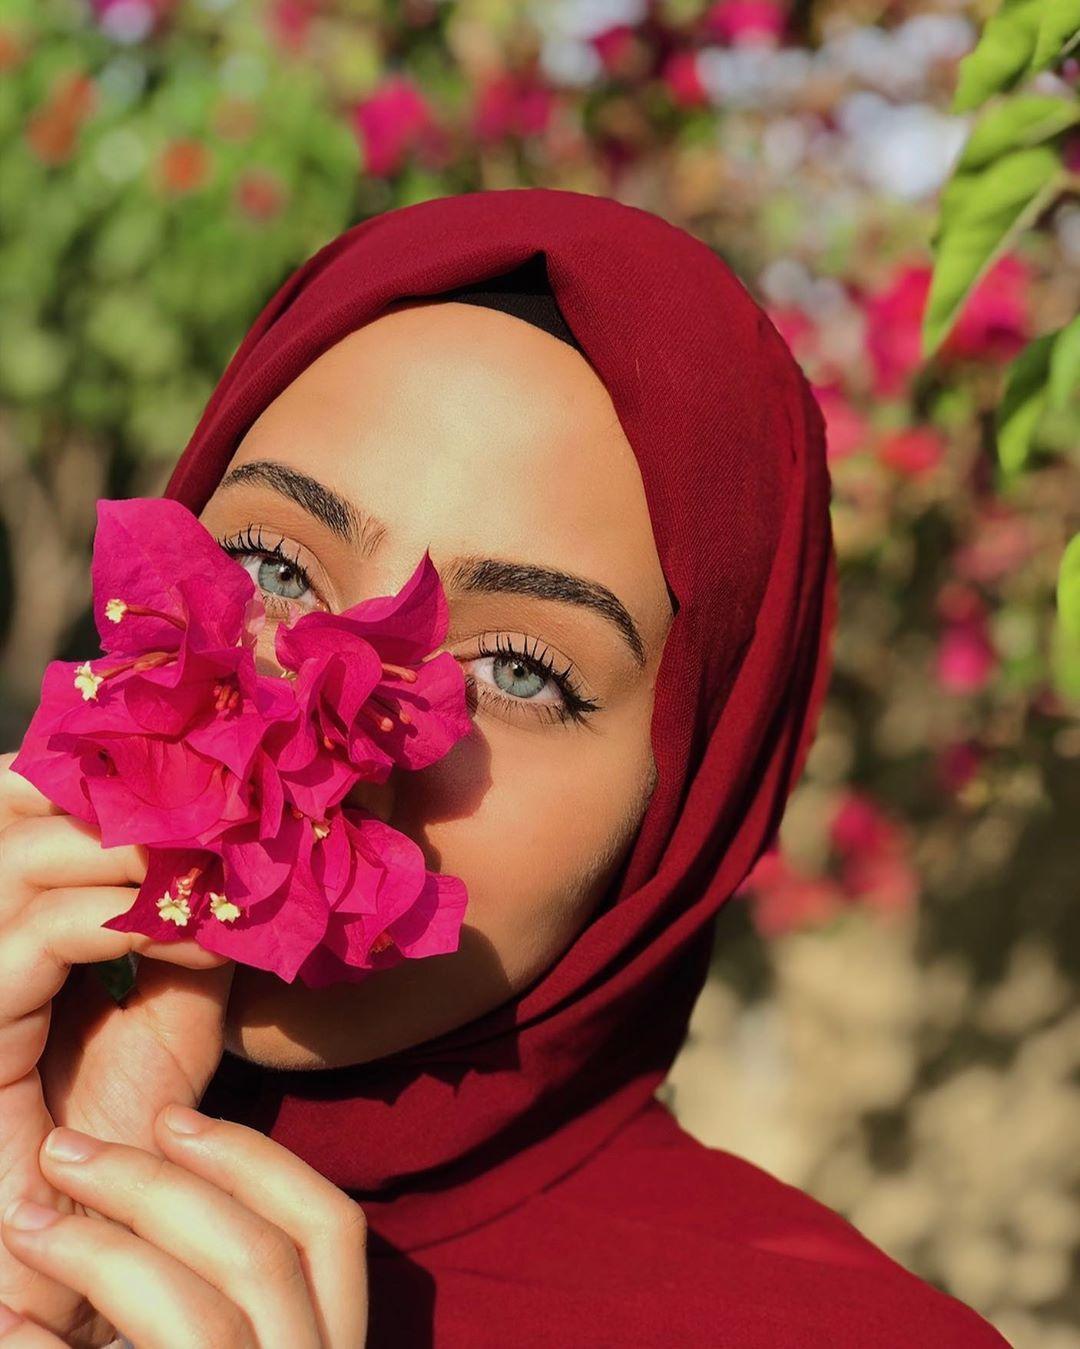 47 4k Likes 925 Comments رغد Raghad Rragoode On Instagram أنت آخر وردة أش م ها قبل أن ي ن Modest Fashion Hijab Girly Photography Beautiful Hijab